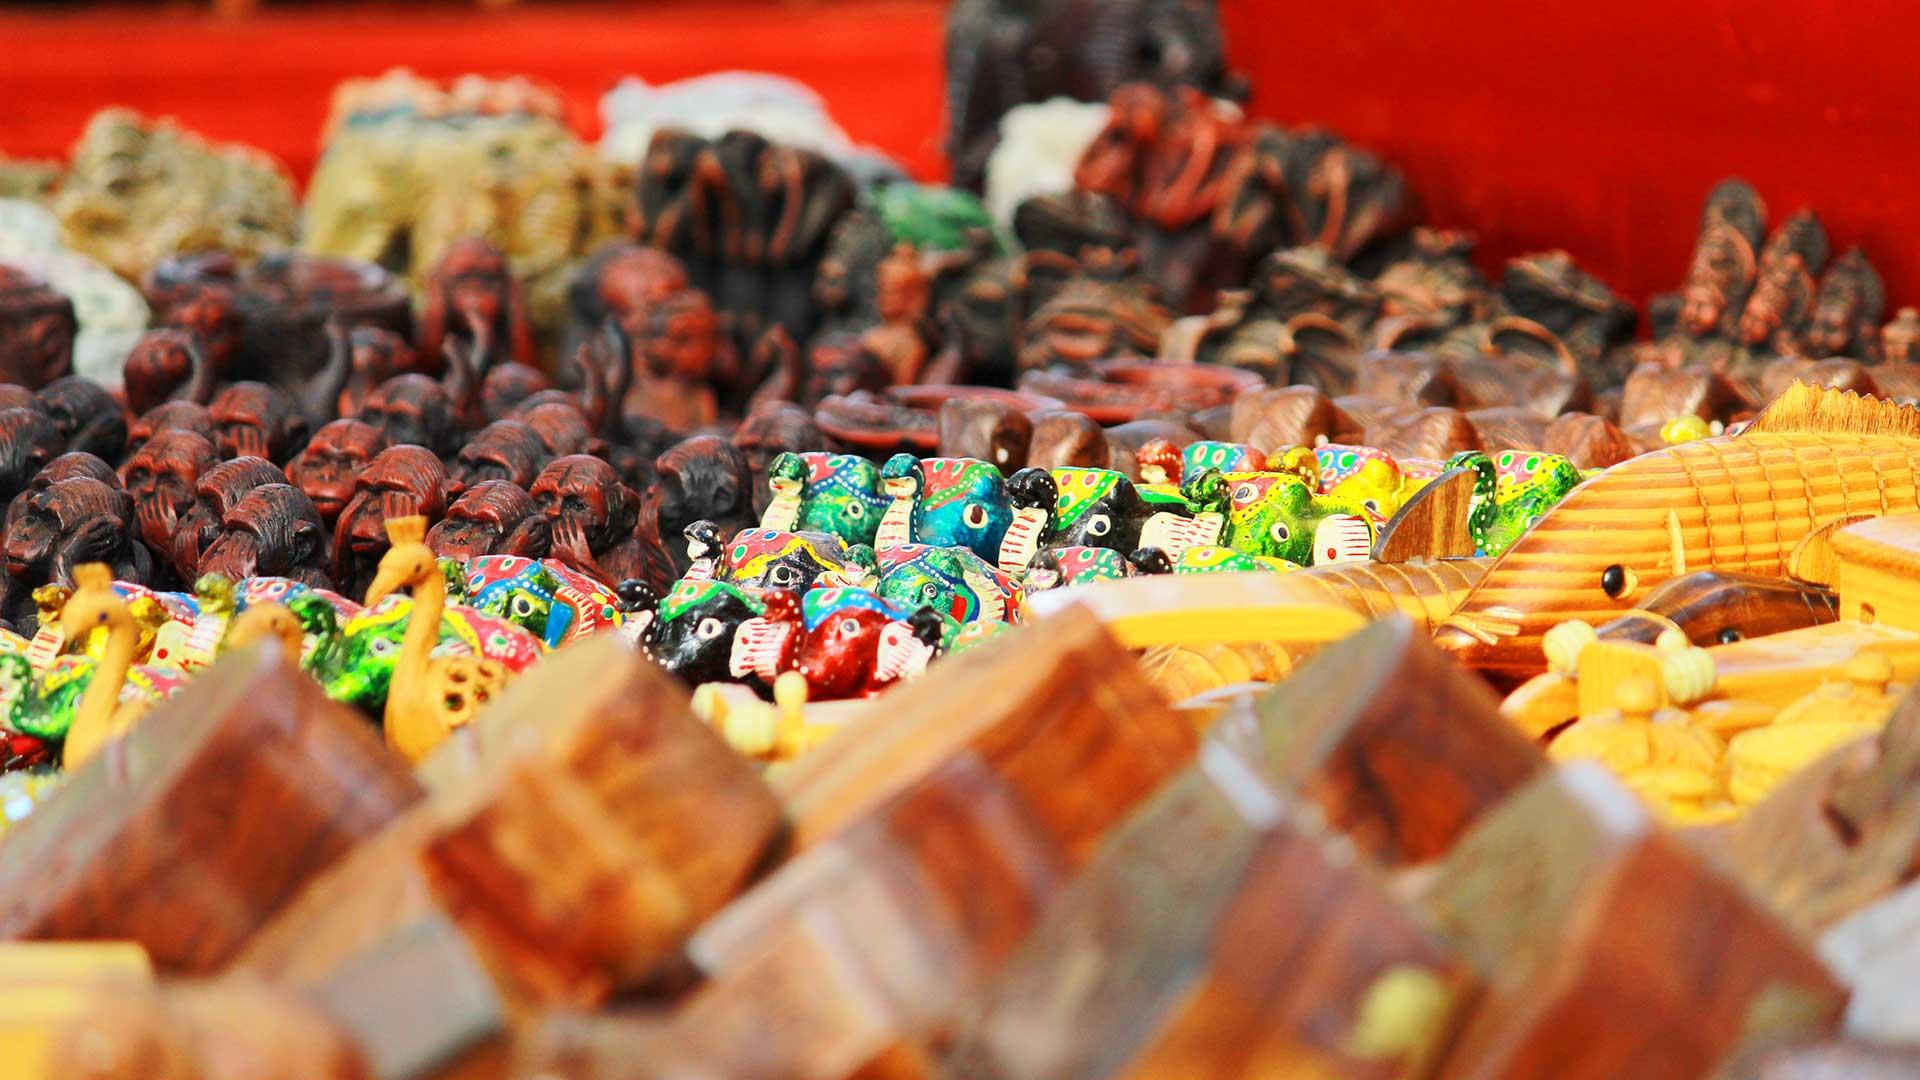 Handicrafts Kochi Street Vendors Kochi Handicrsft Products At Kochi